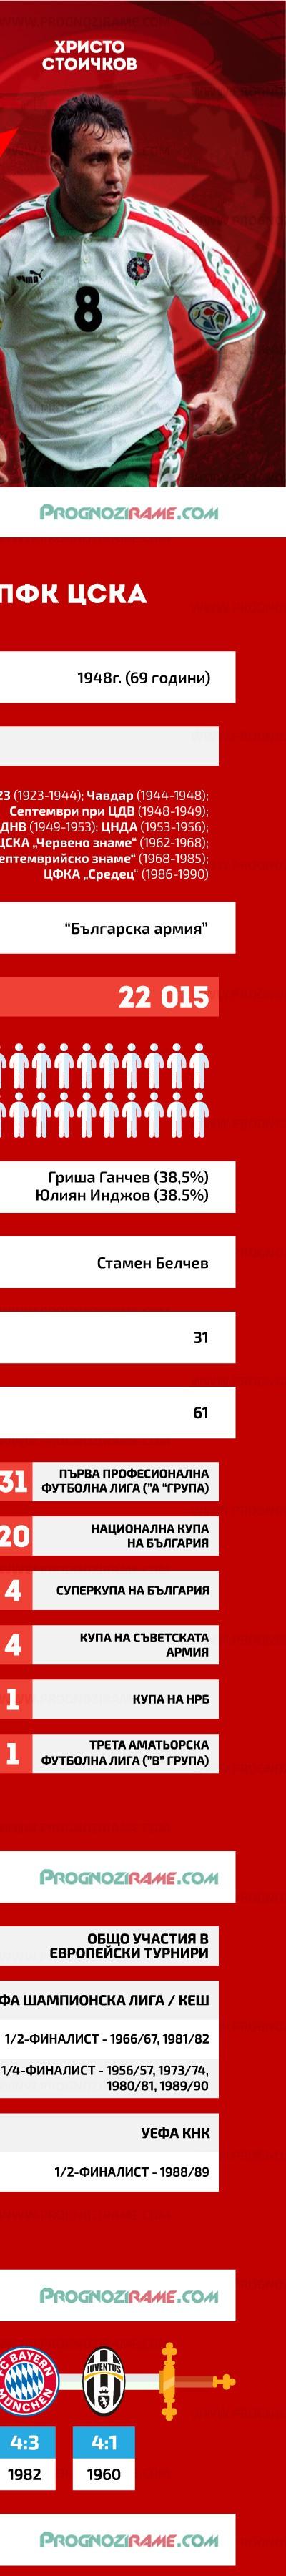 Левски срещу ЦСКА - prognozirame.com [3]